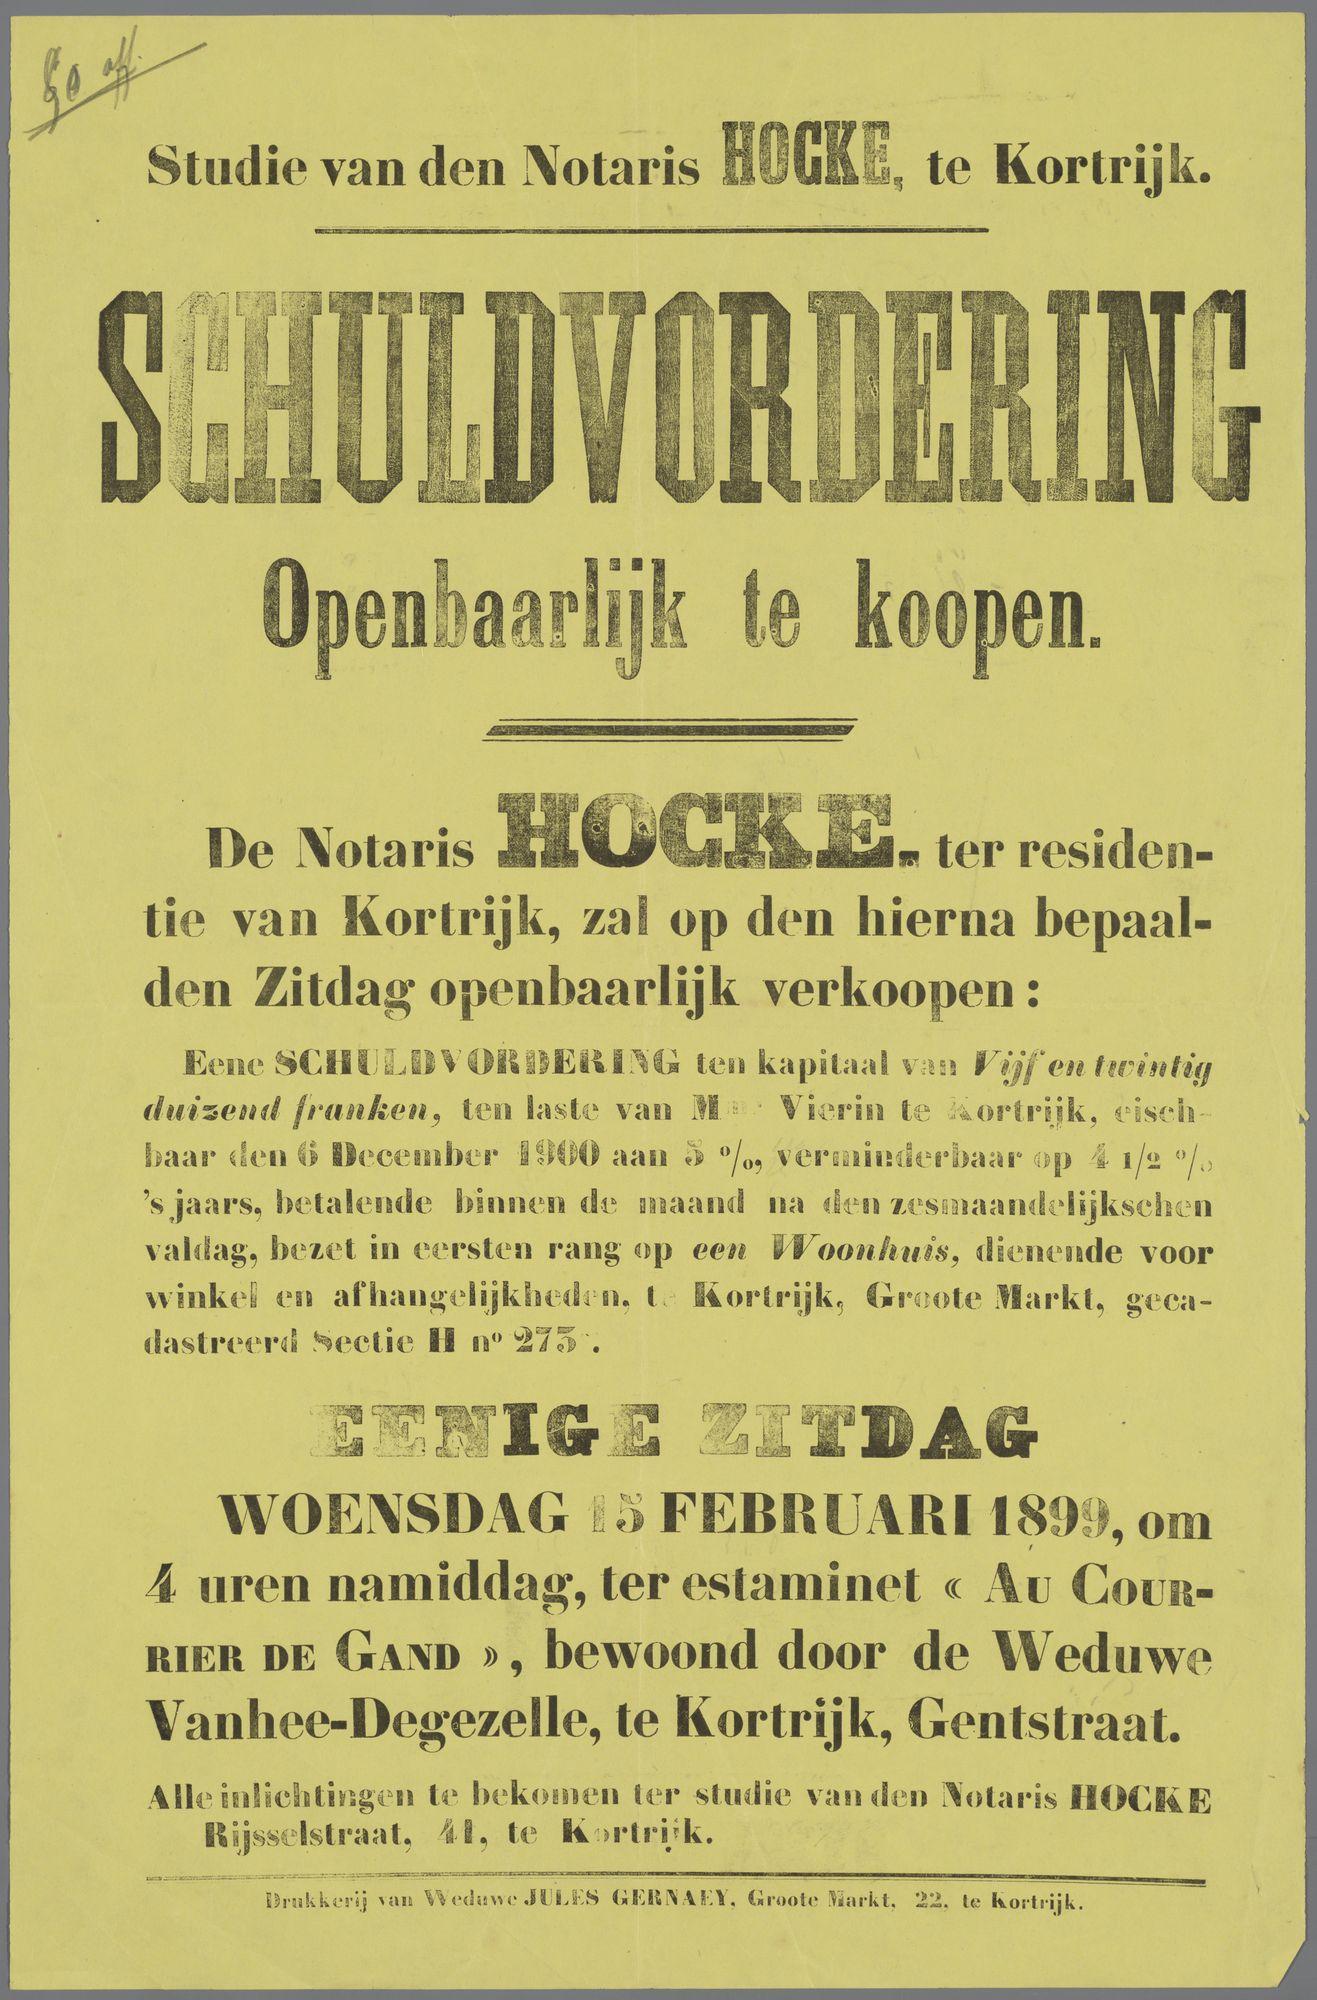 Verkoop schuldvordering Mr Vierin 1899